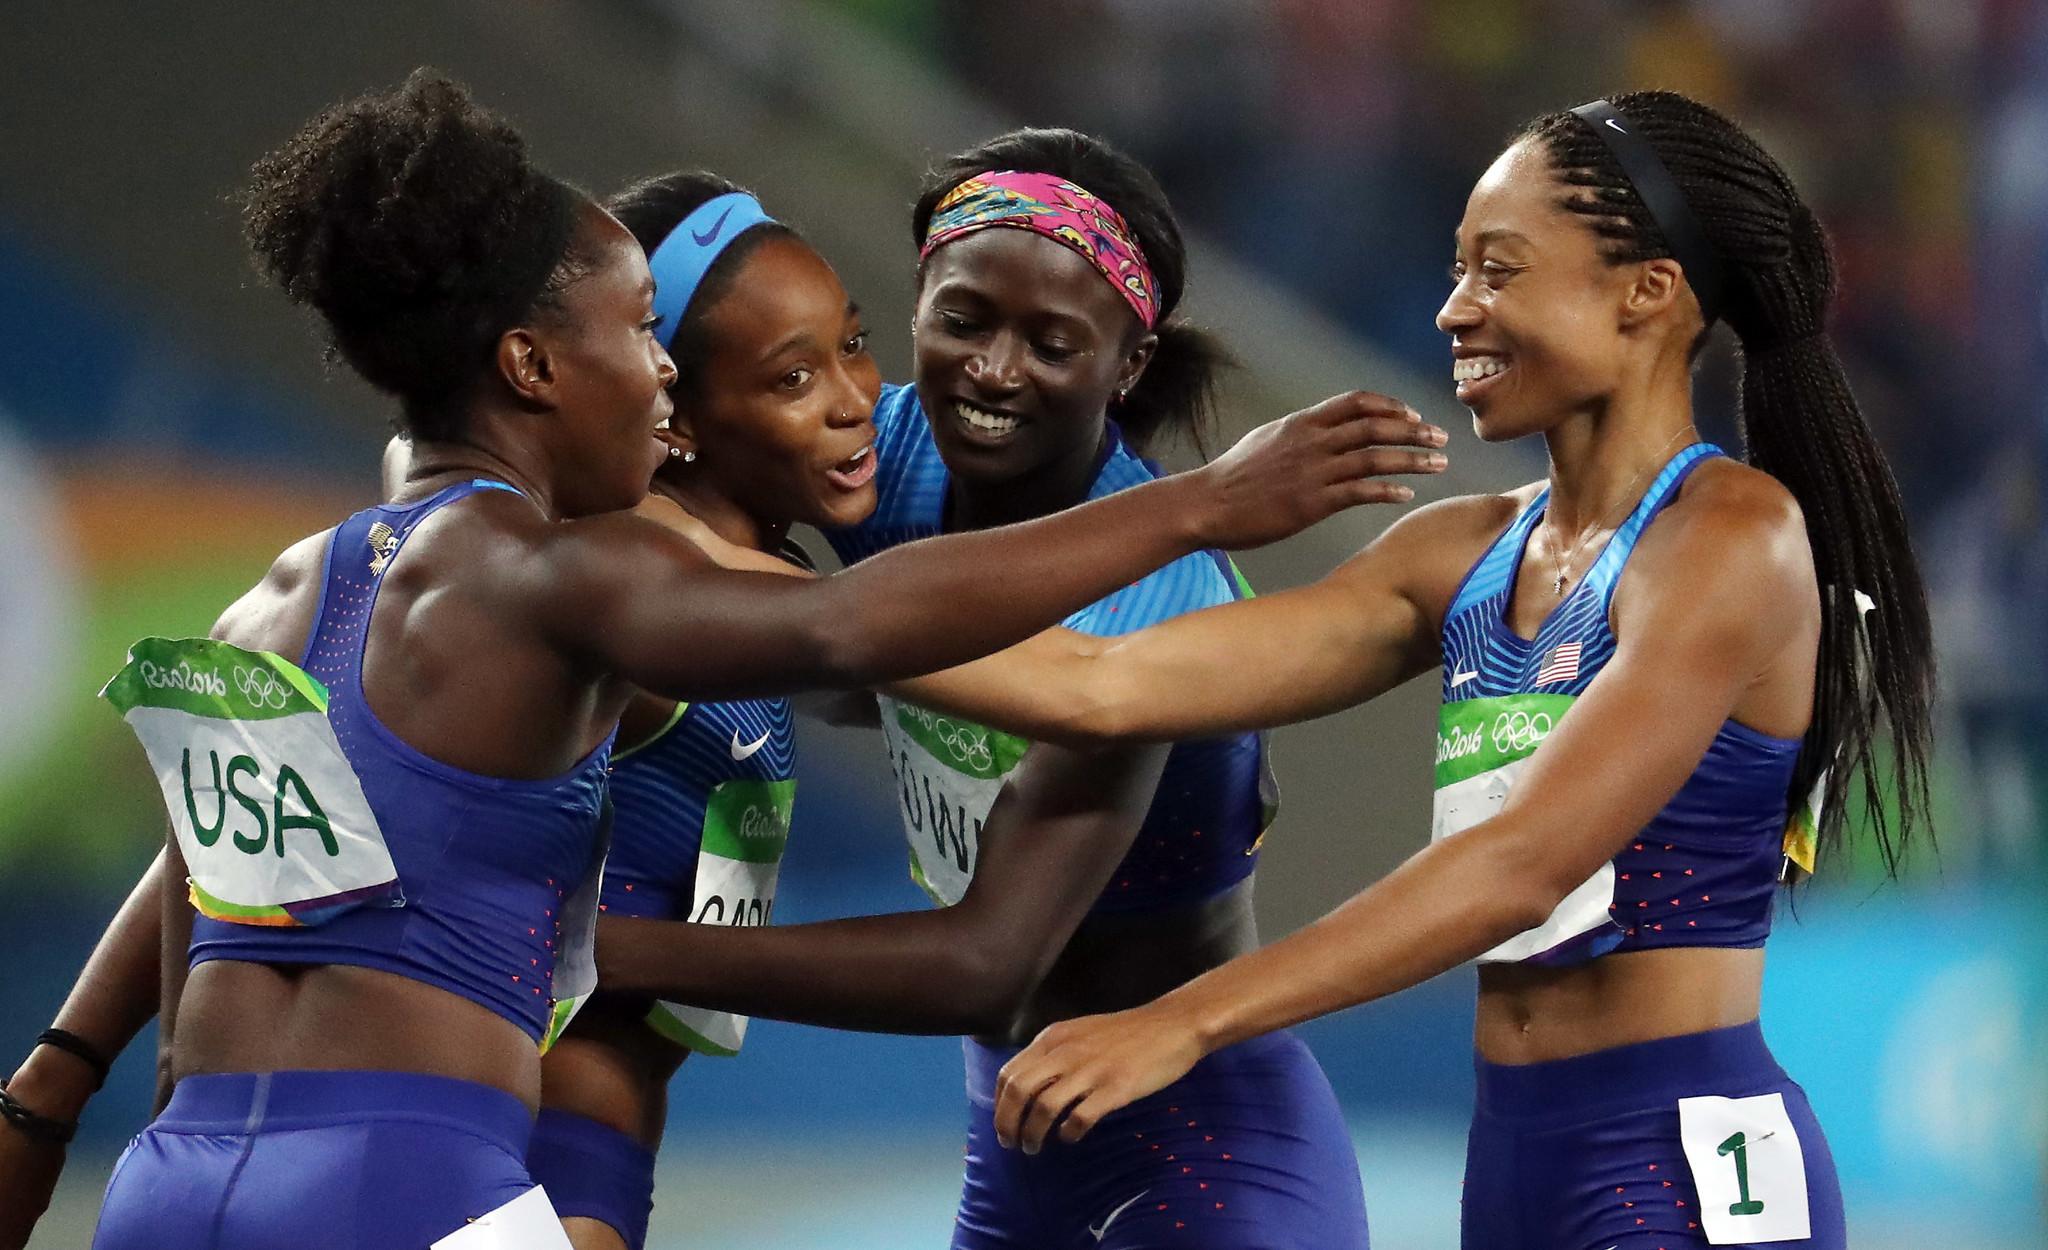 U.S. women win 400-meter relay, repeat as gold medalists - Chicago Tribune